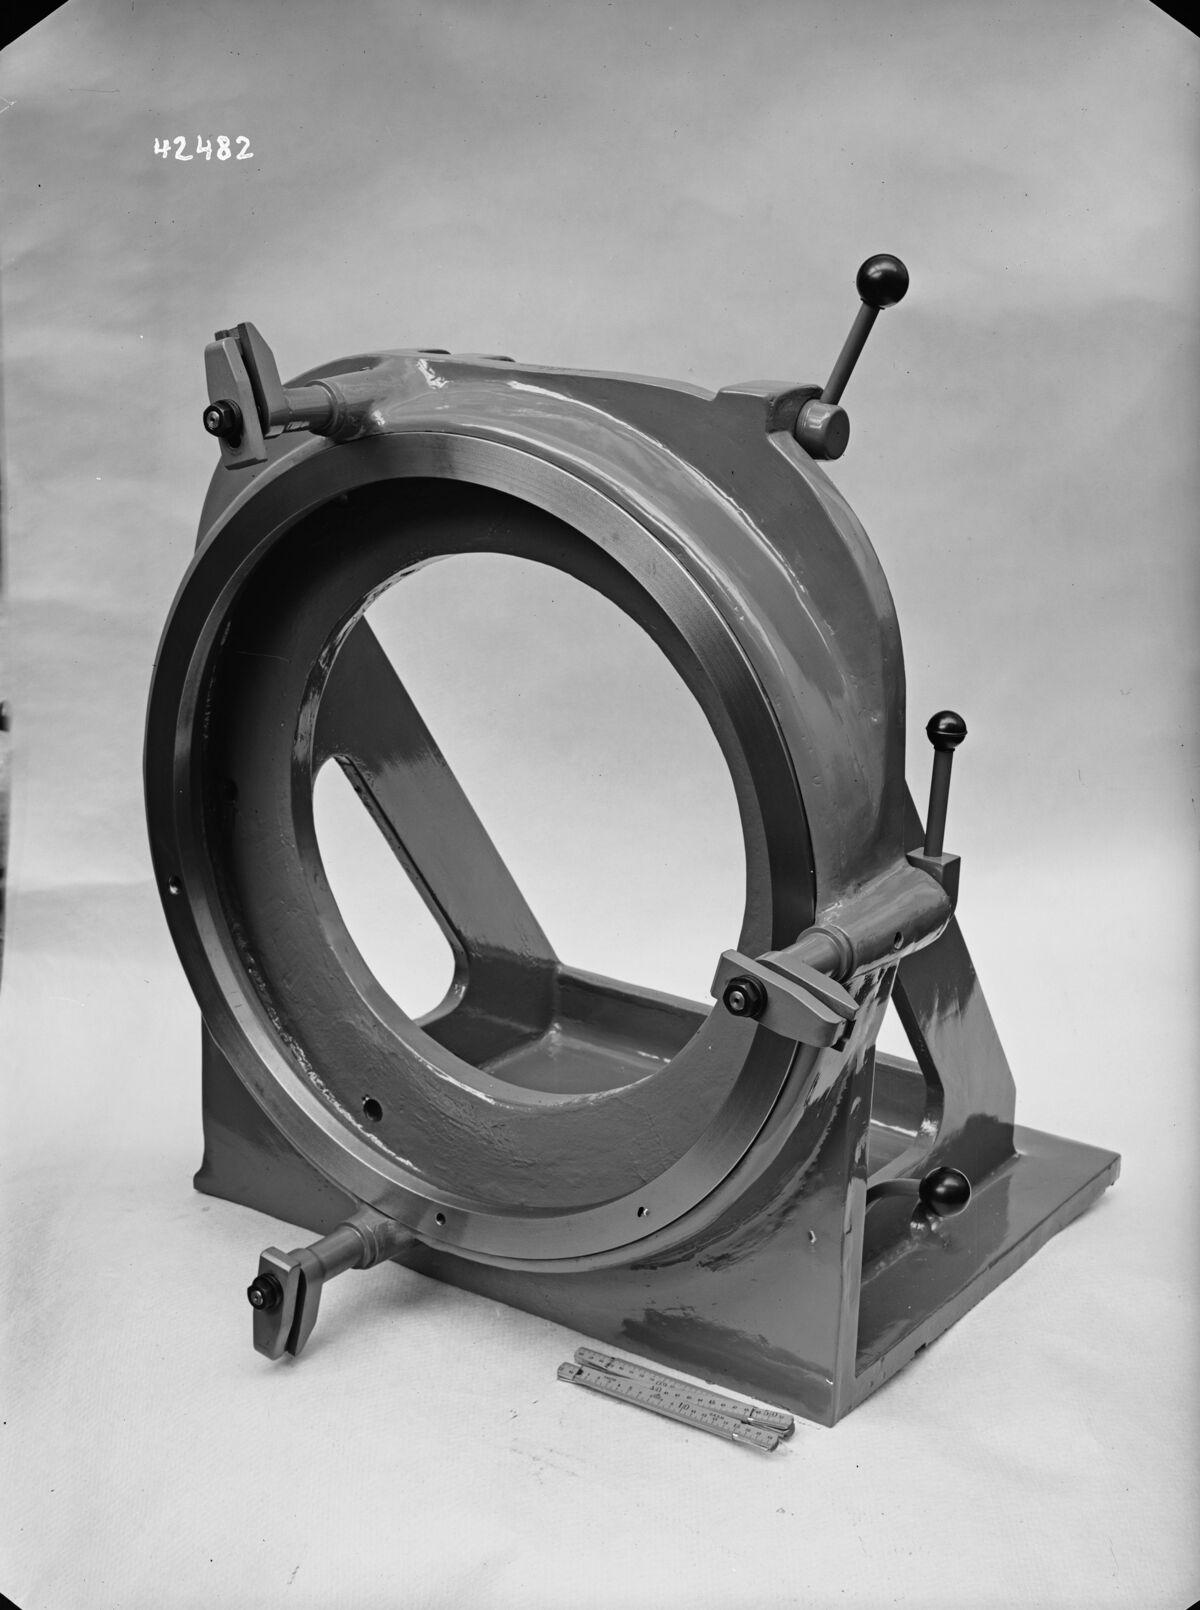 GFA 16/42482: Machine tool gauge